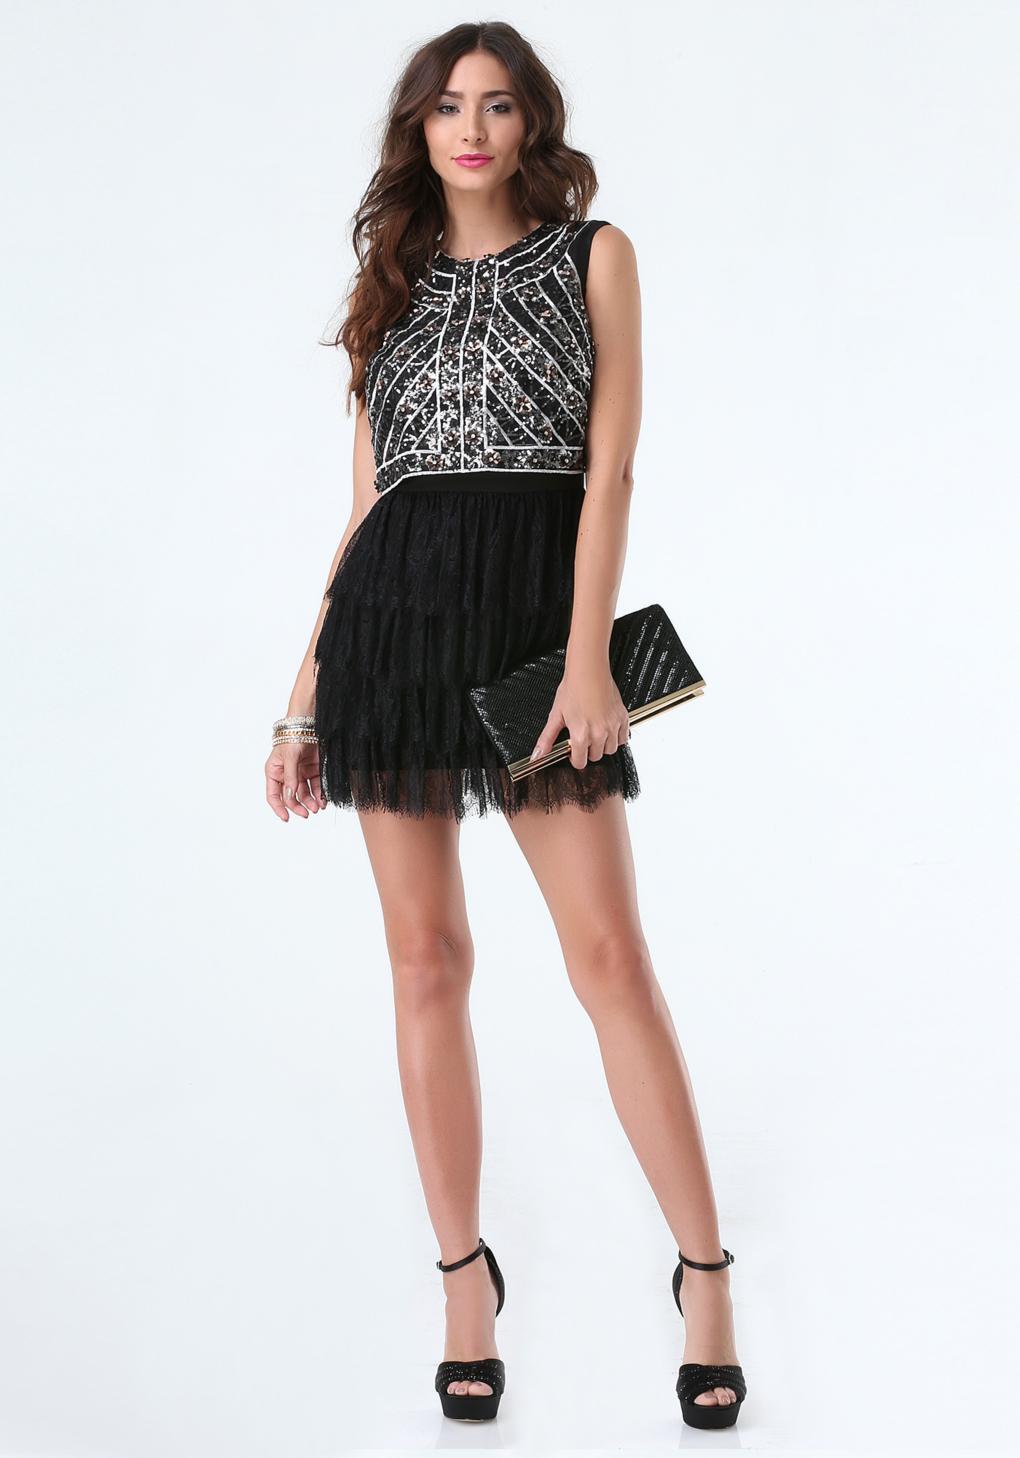 Lyst Bebe Sequin Amp Lace Ruffle Dress In Black